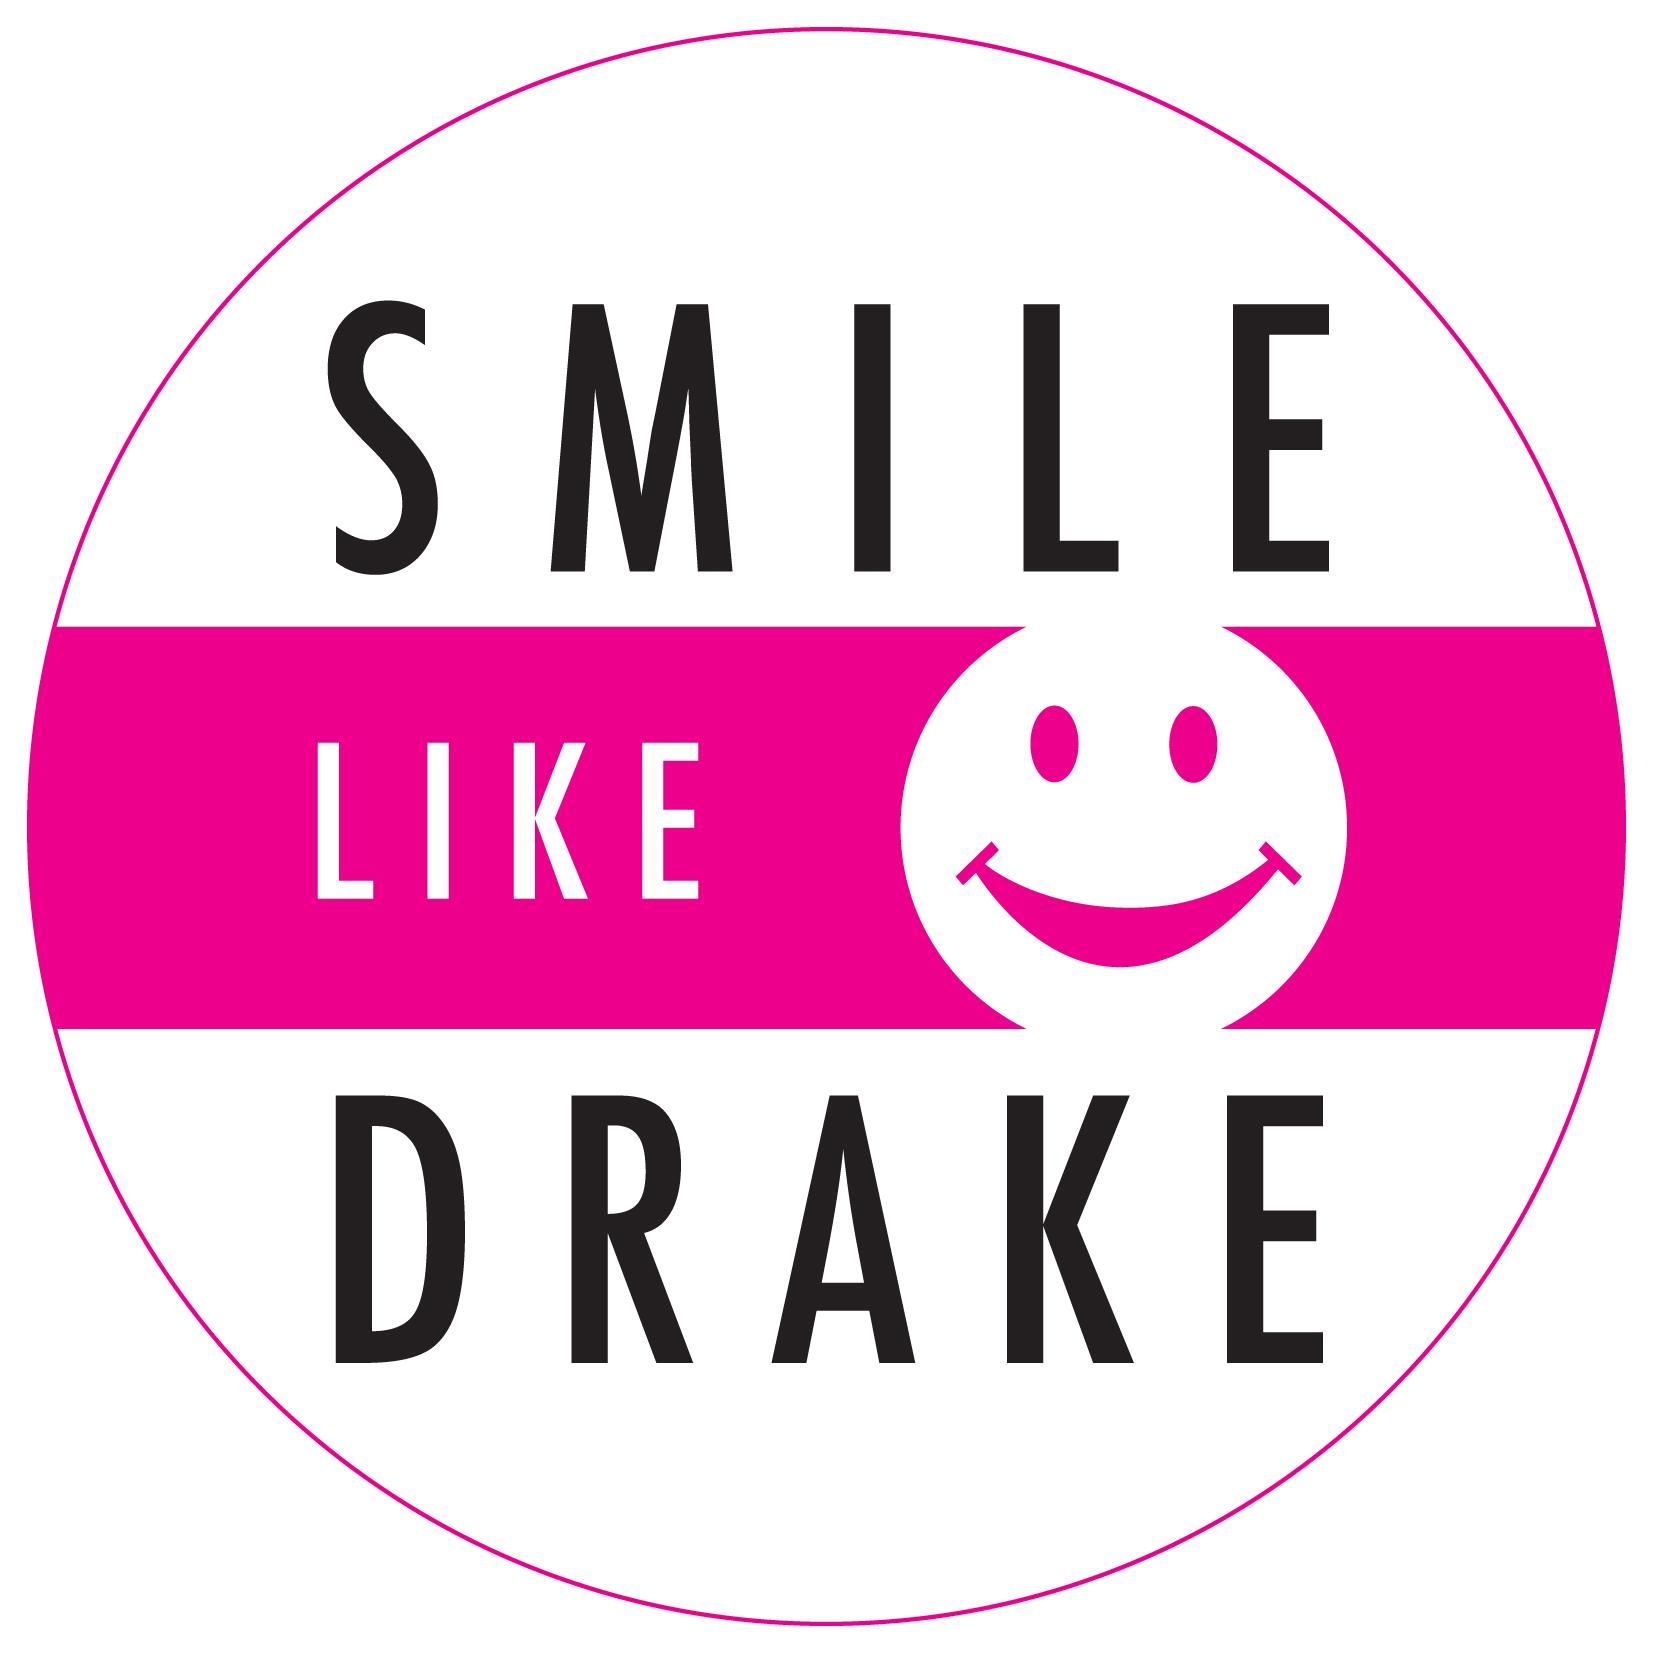 SMILE-LIKE-DRAKE_135mm_Sticker-Artwork_keyline_RGB.jpg